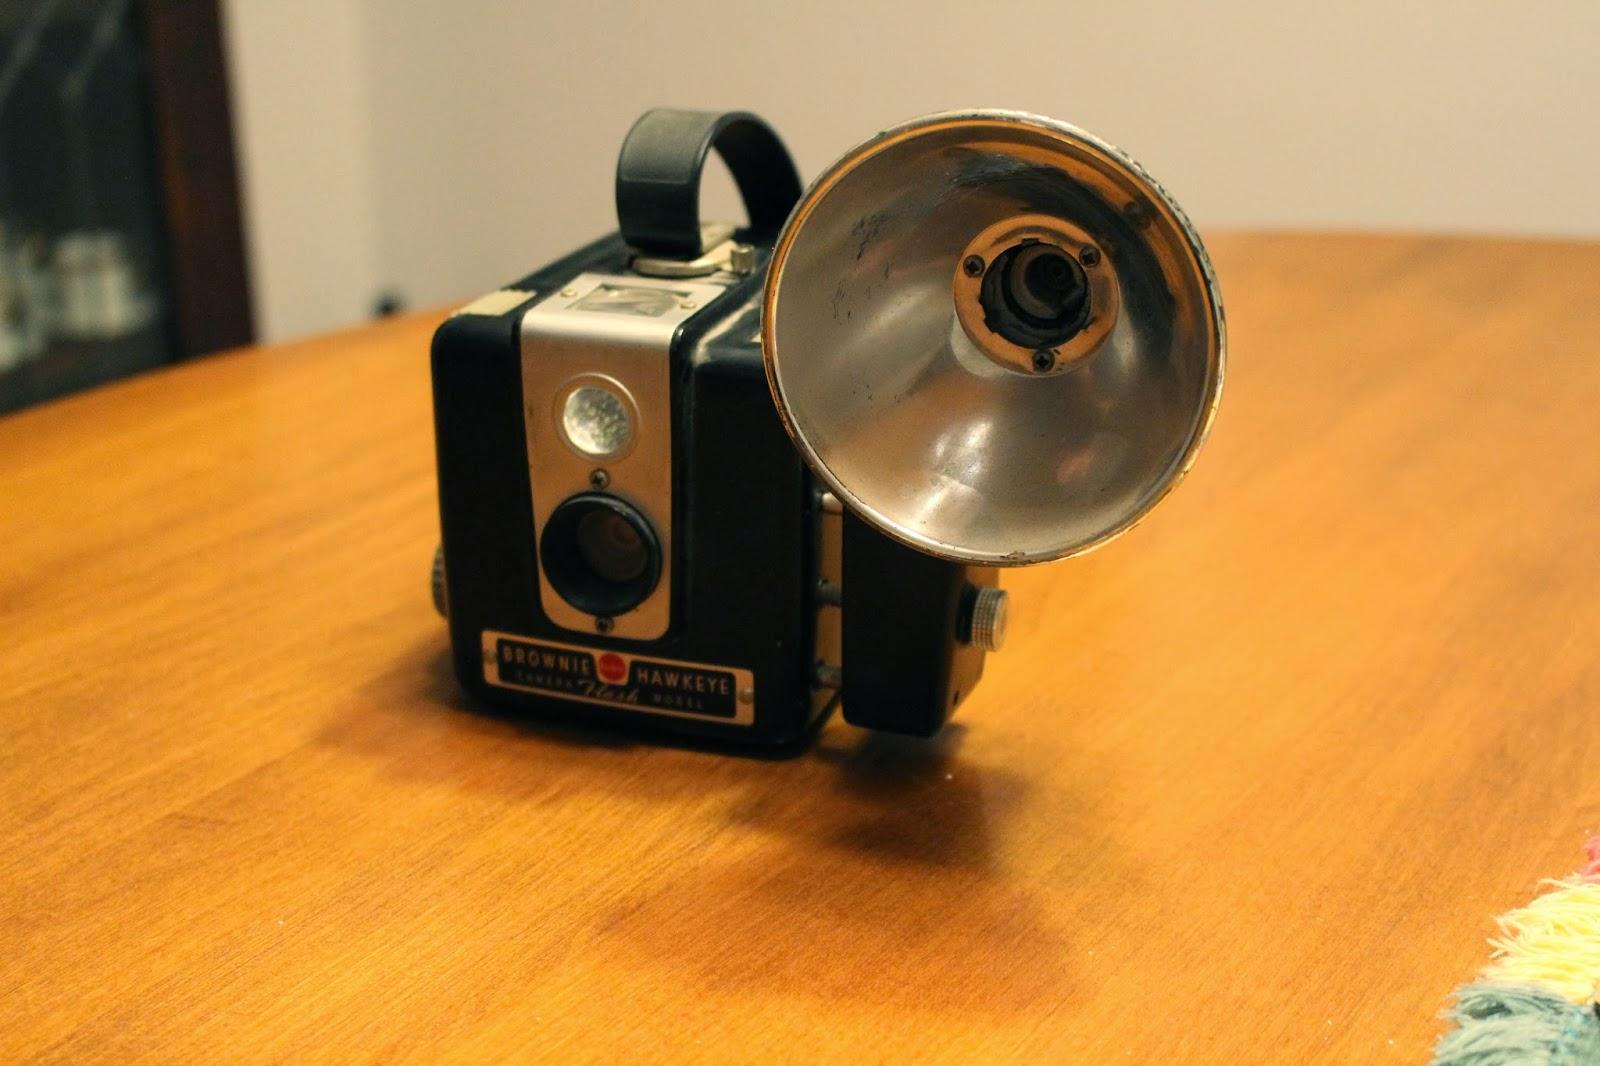 how to use a brownie hawkeye camera flash model